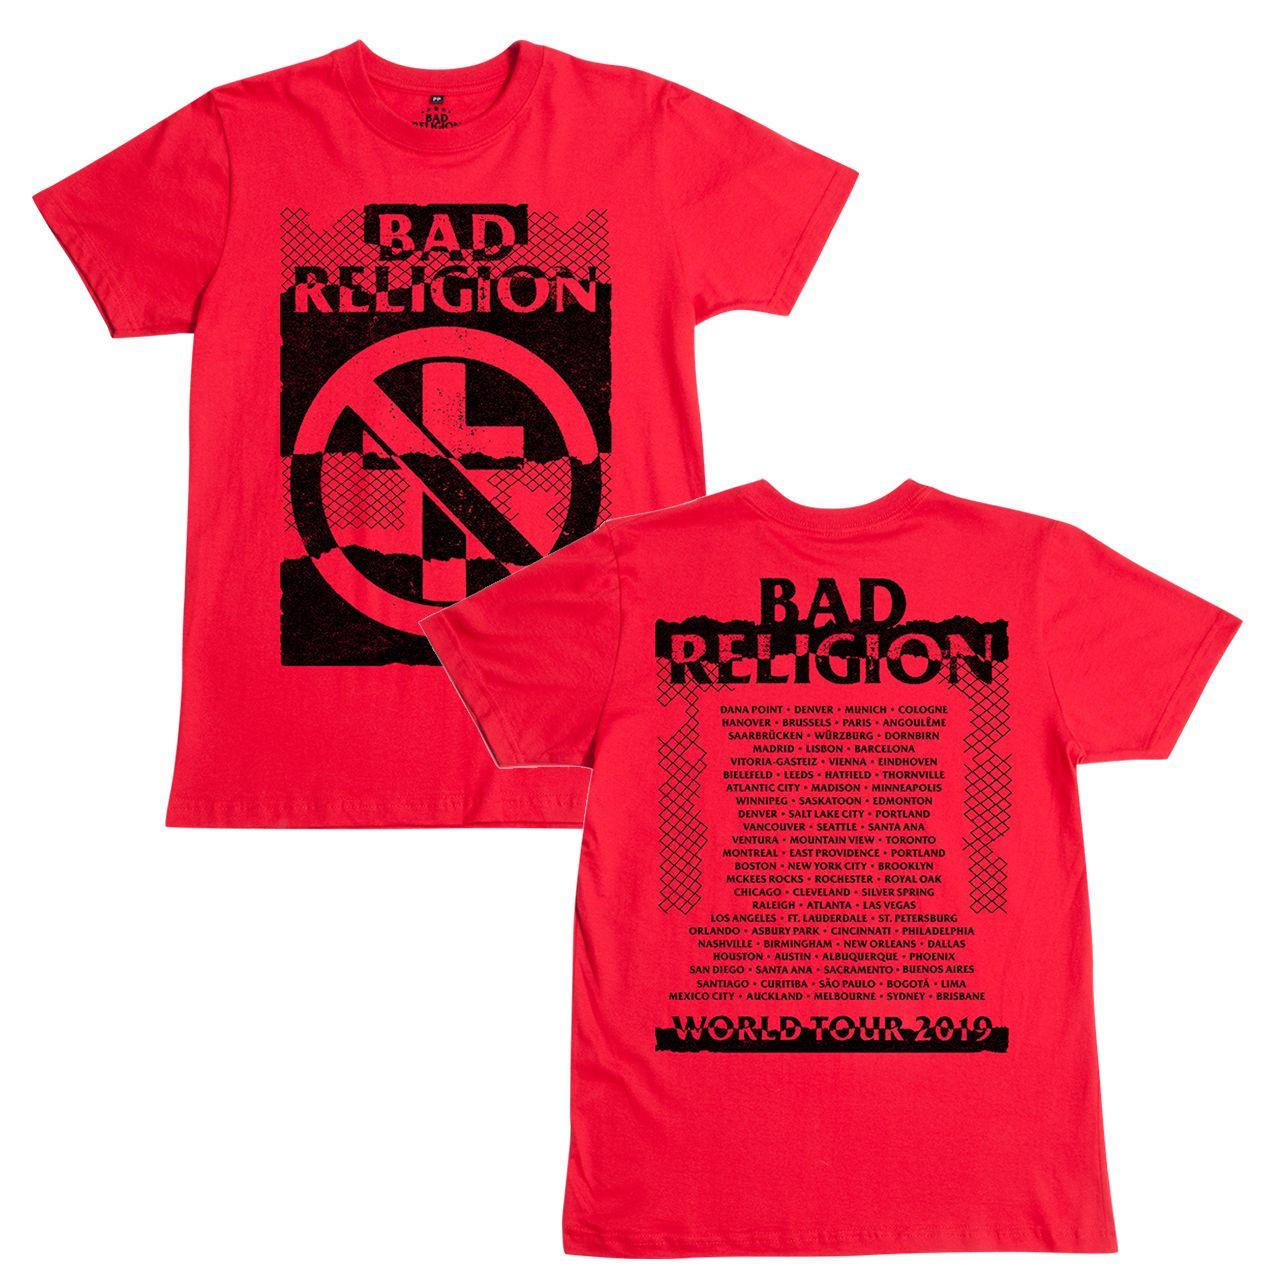 Bad Religion - Ripper Tour 2019